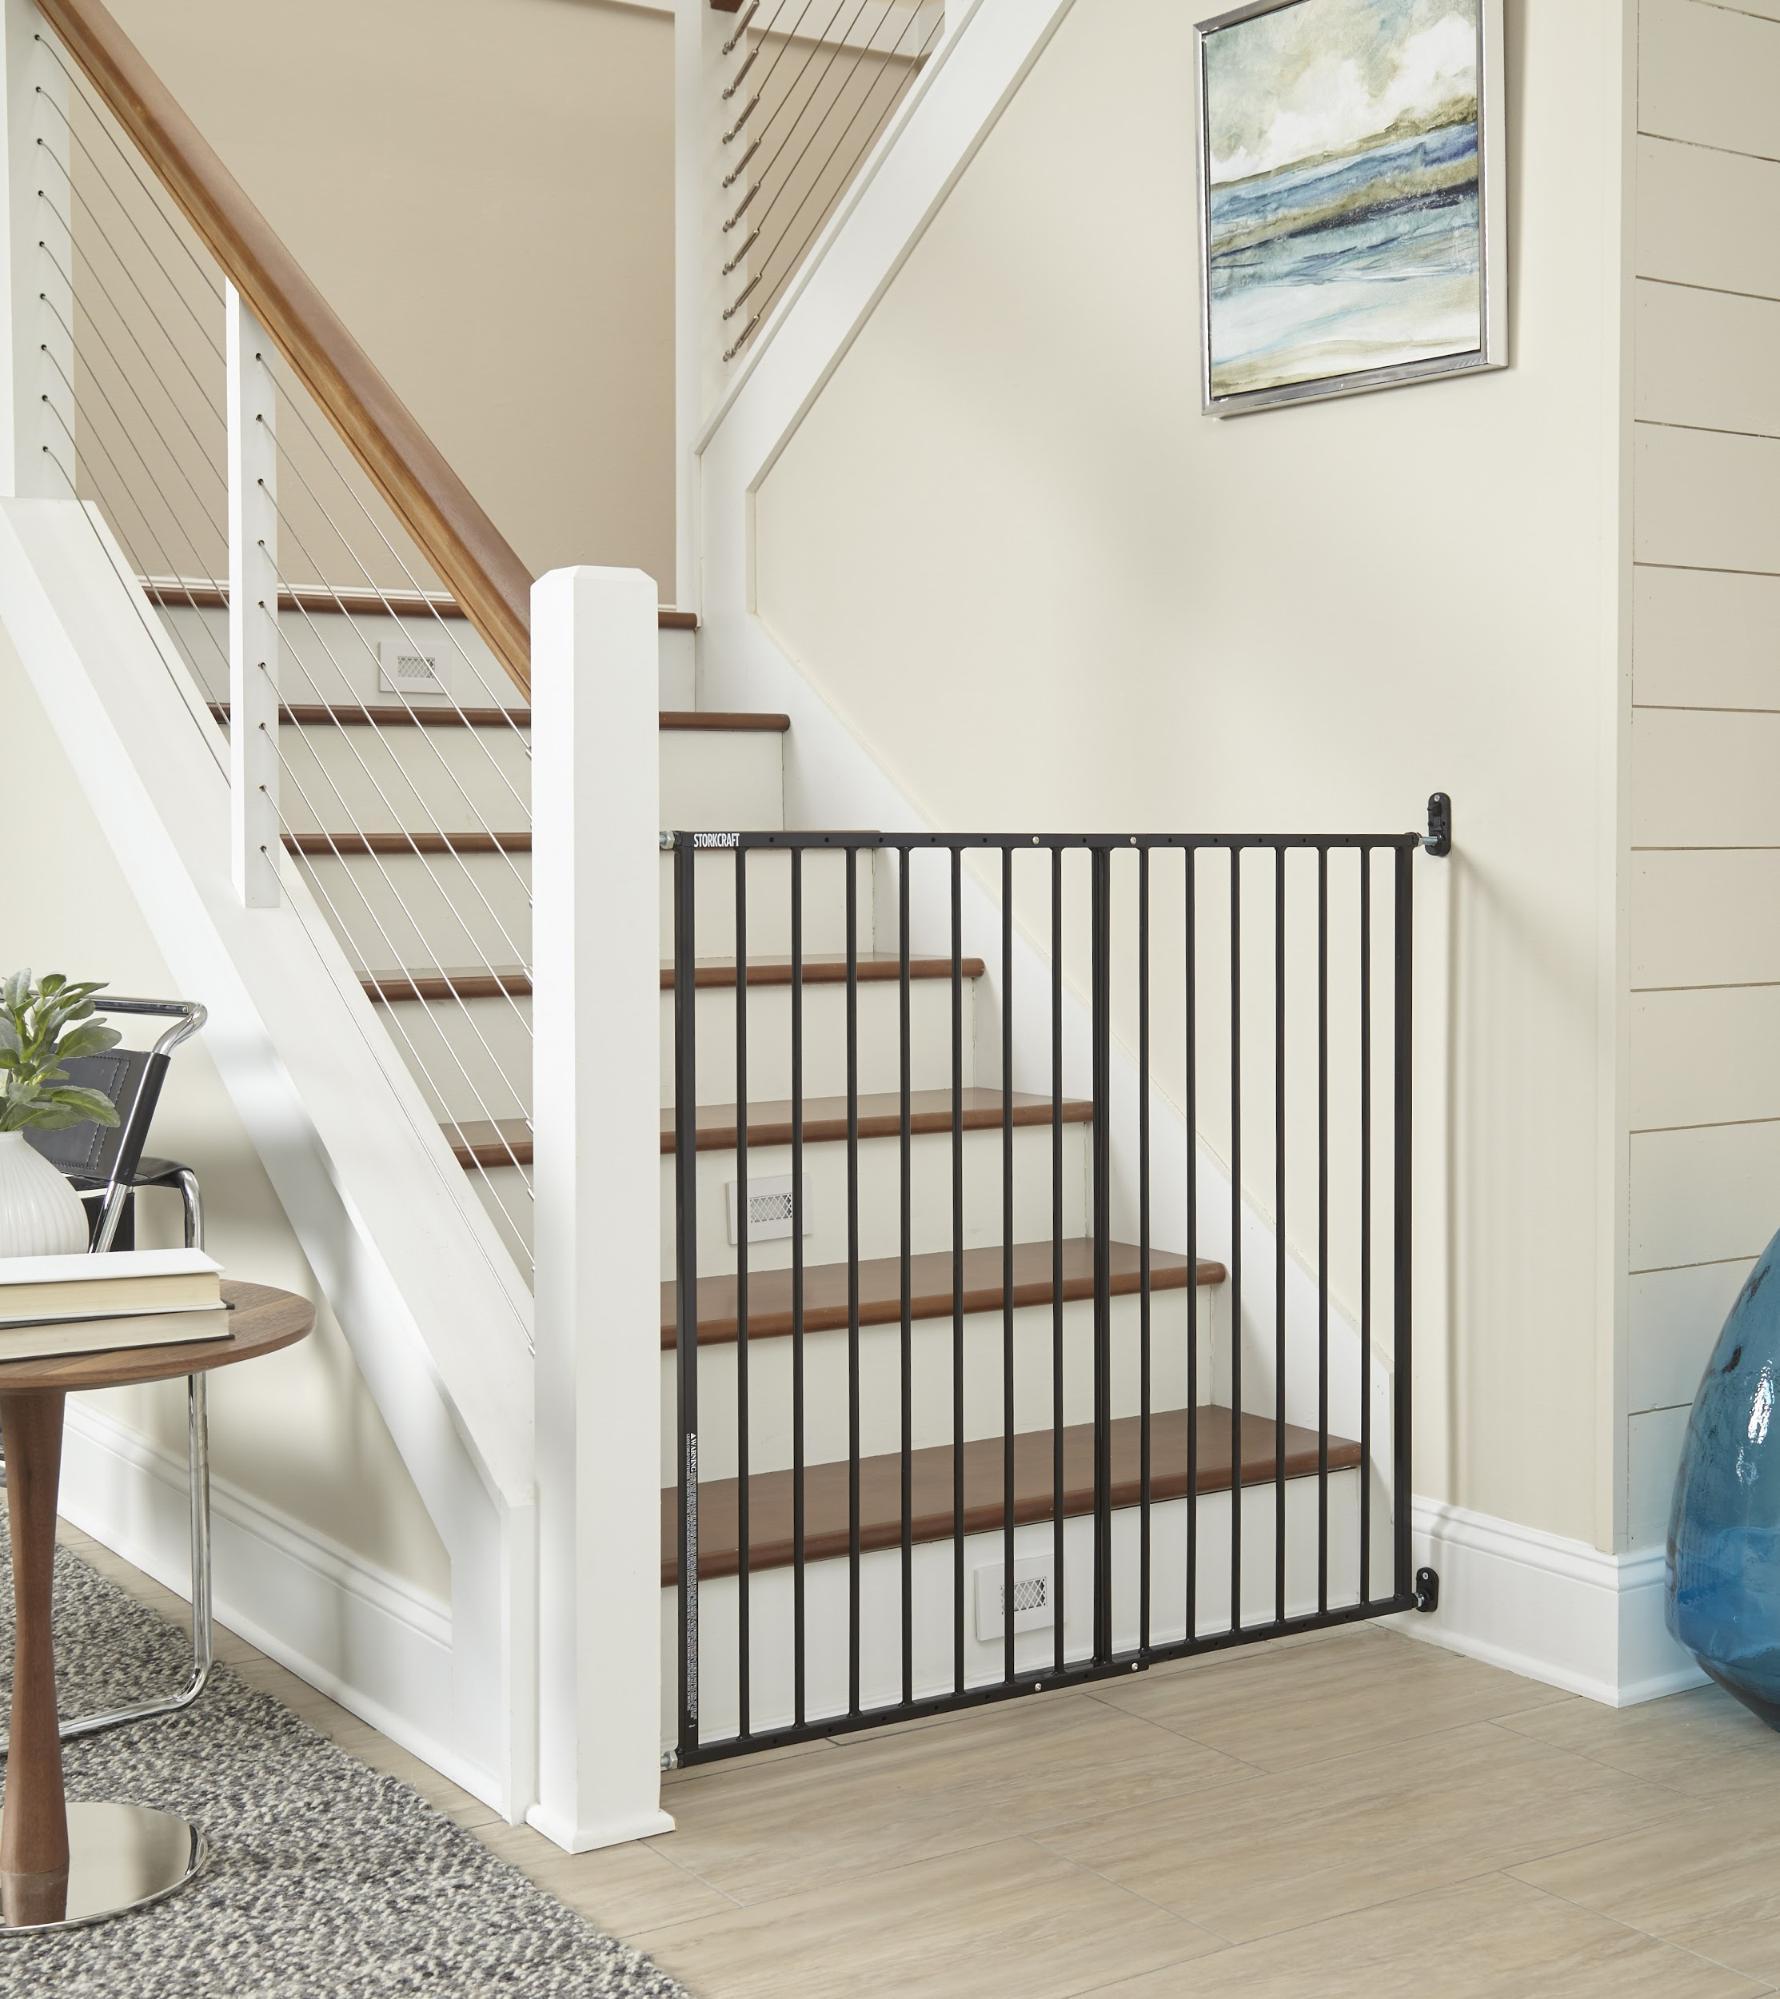 kid-friendly home - simple black gate